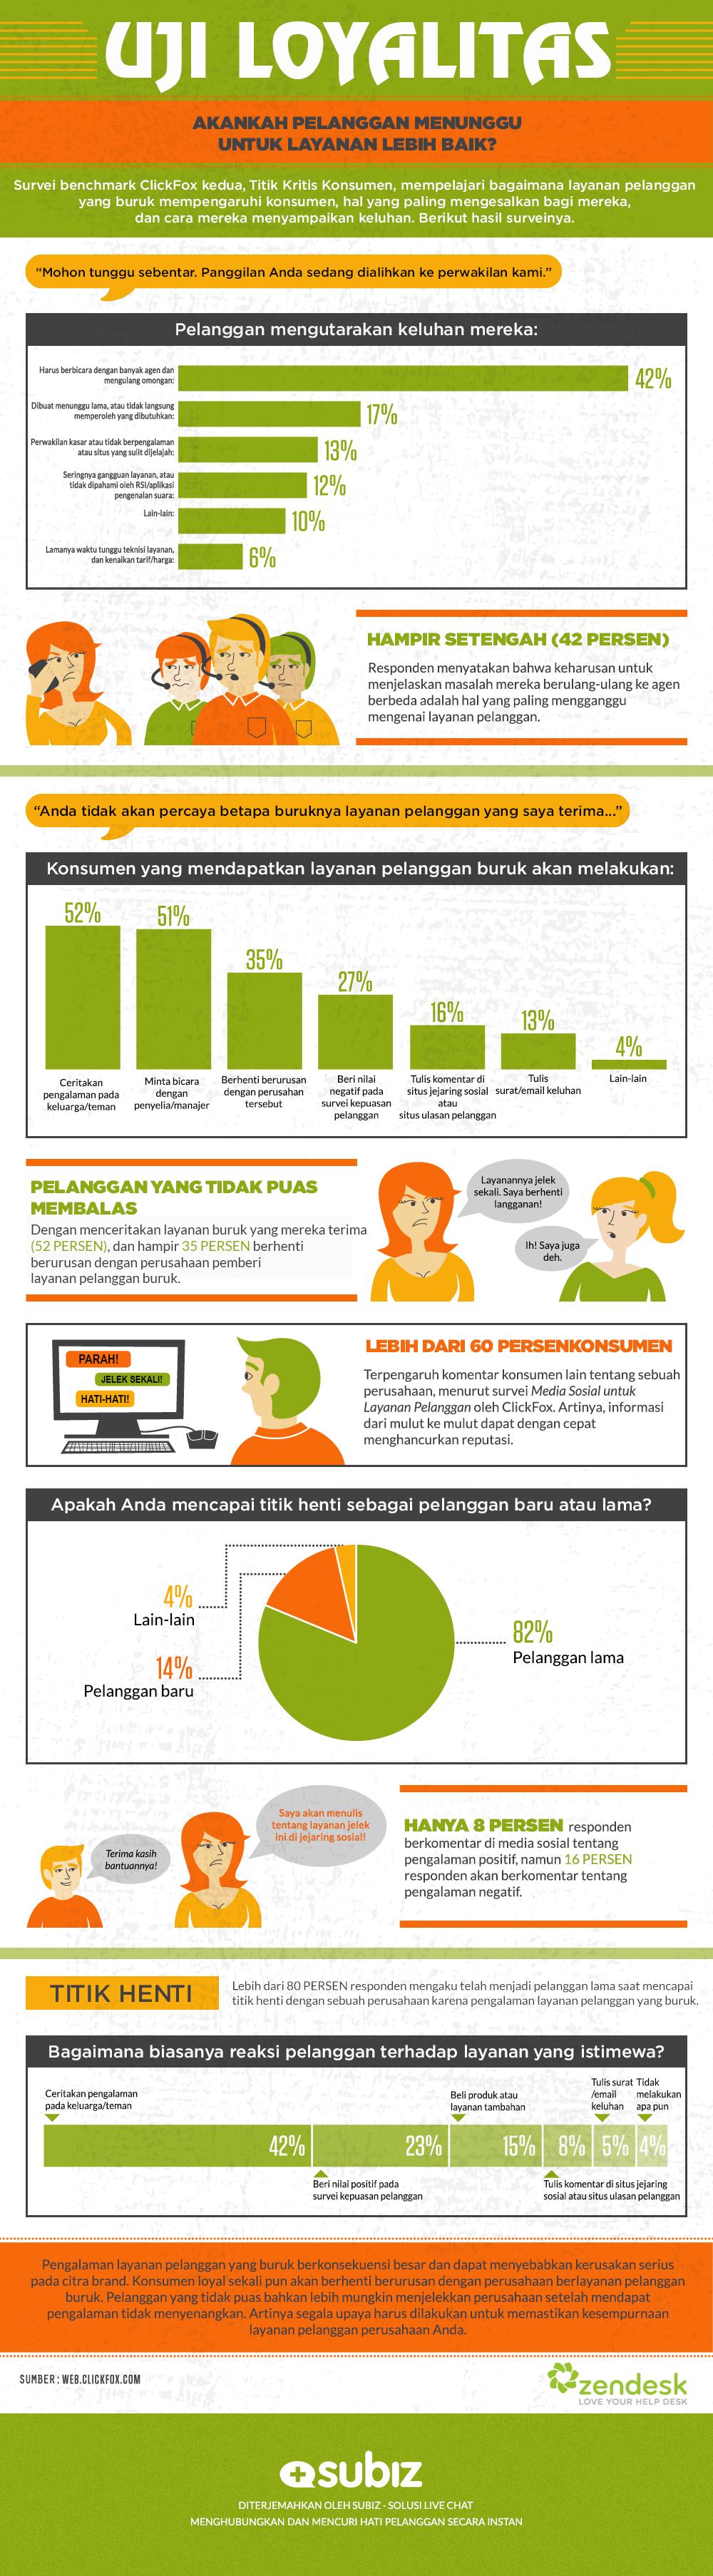 Uji loyalitas infographic Subiz